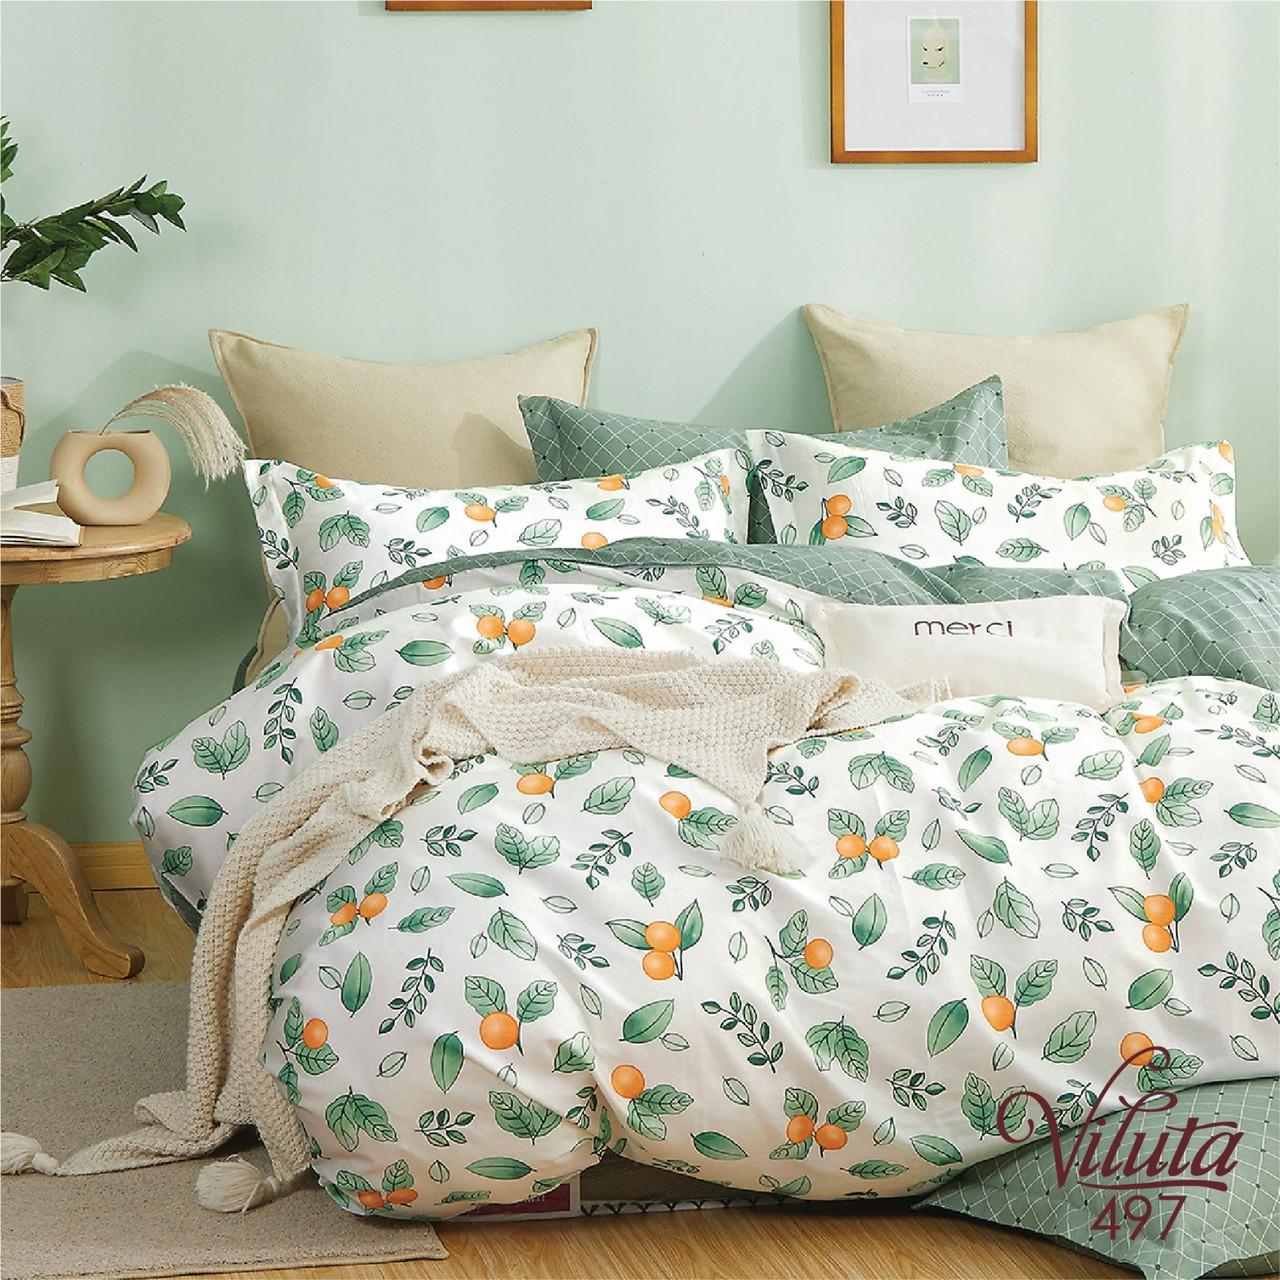 Комплект постельного белья Сатин Twill 497 ТМ Вилюта